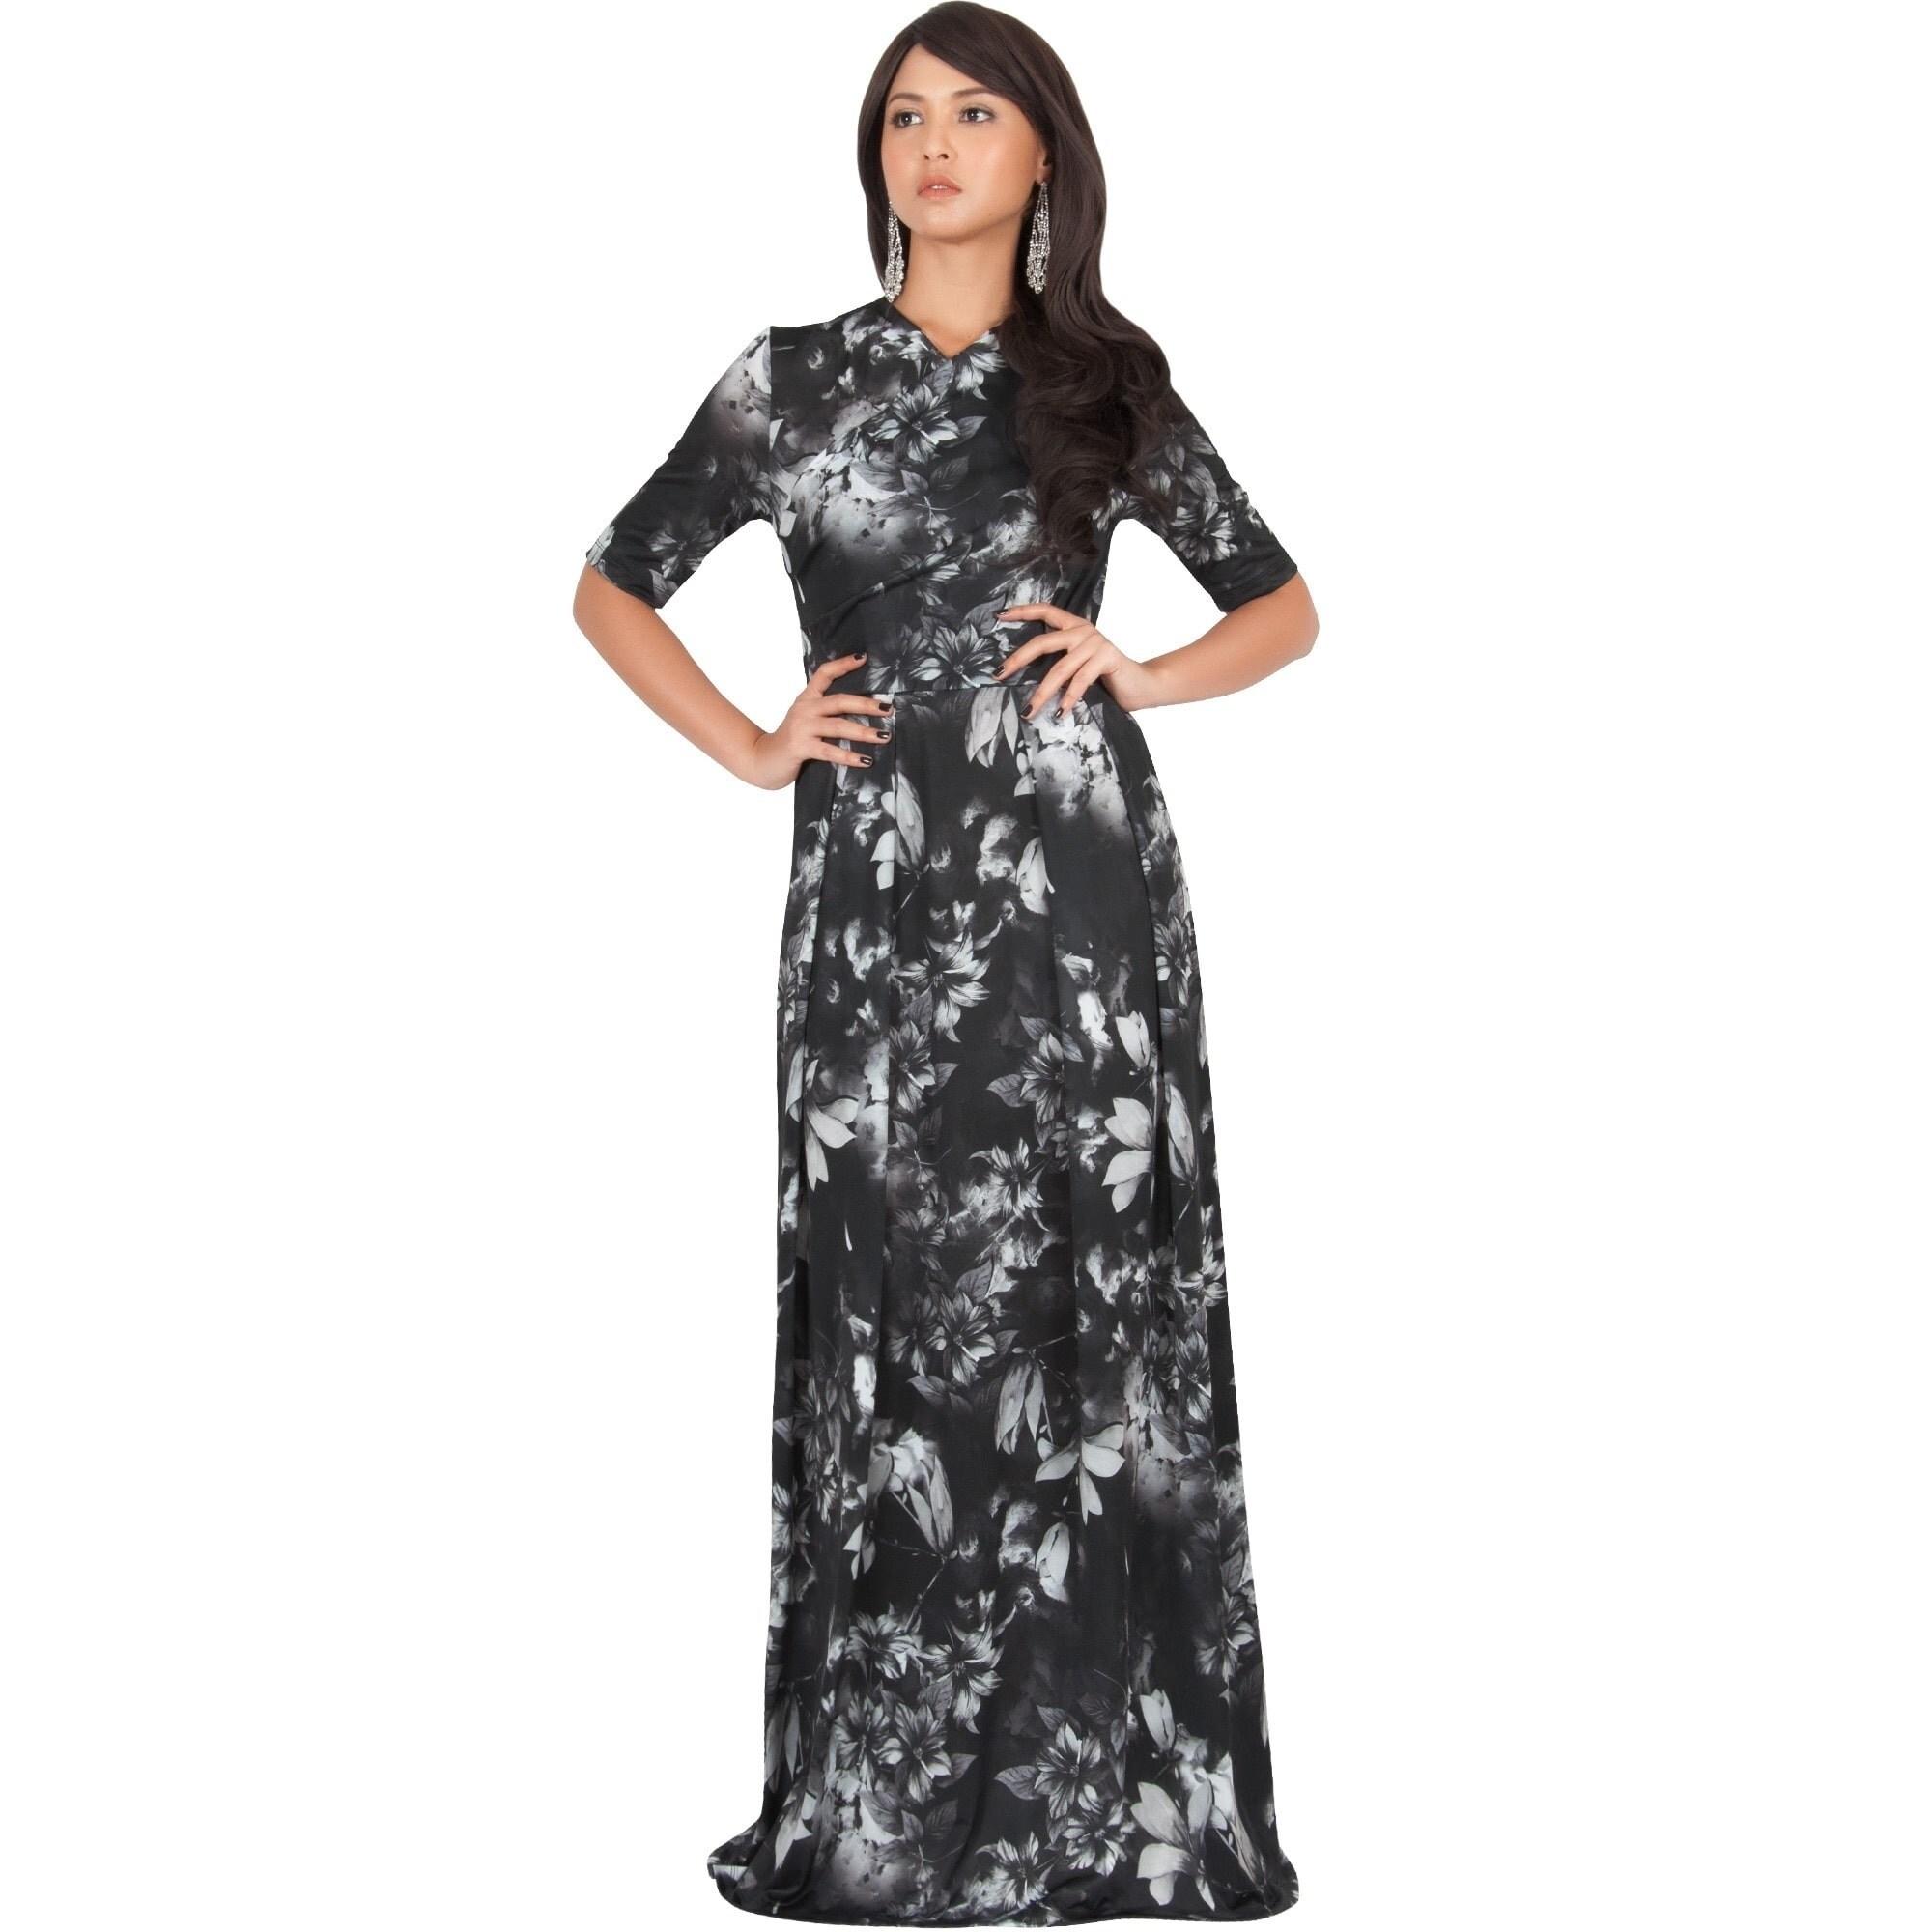 f1ab4ffb5998 Koh Koh Women s Long Summer Floral-print Short-sleeved Flowy Maxi Dress